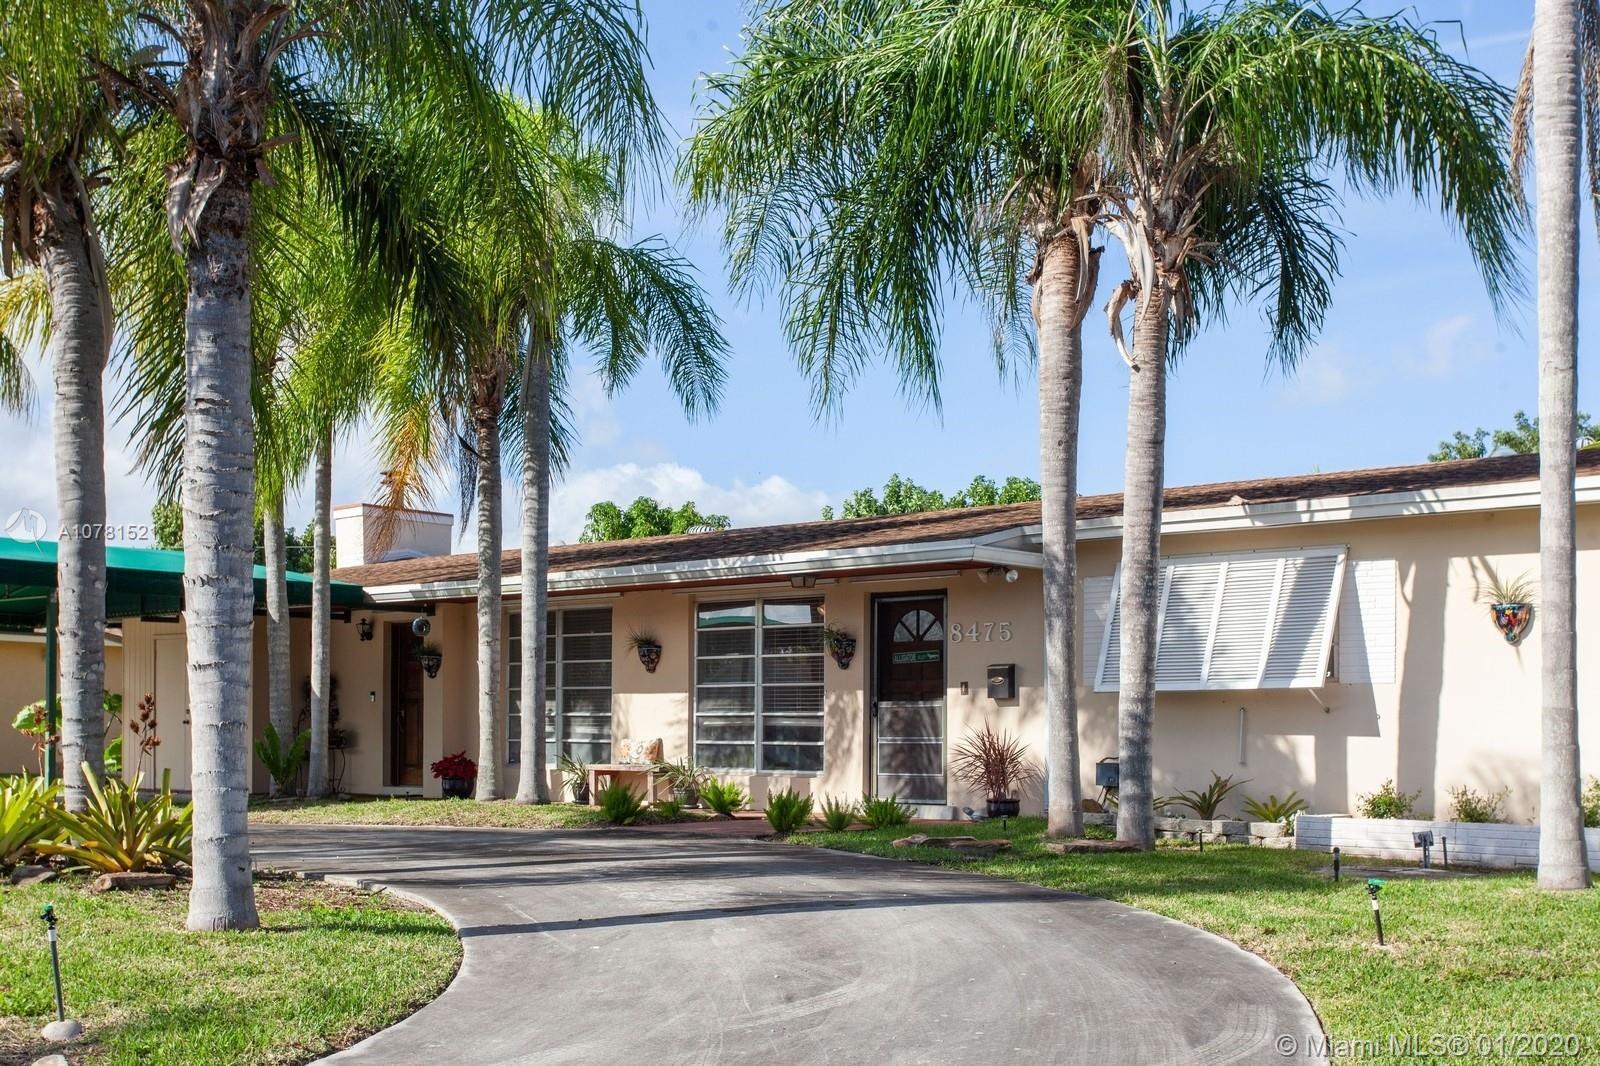 8475 SW 185th Ter, Cutler Bay, FL 33157 - Cutler Bay, FL real estate listing